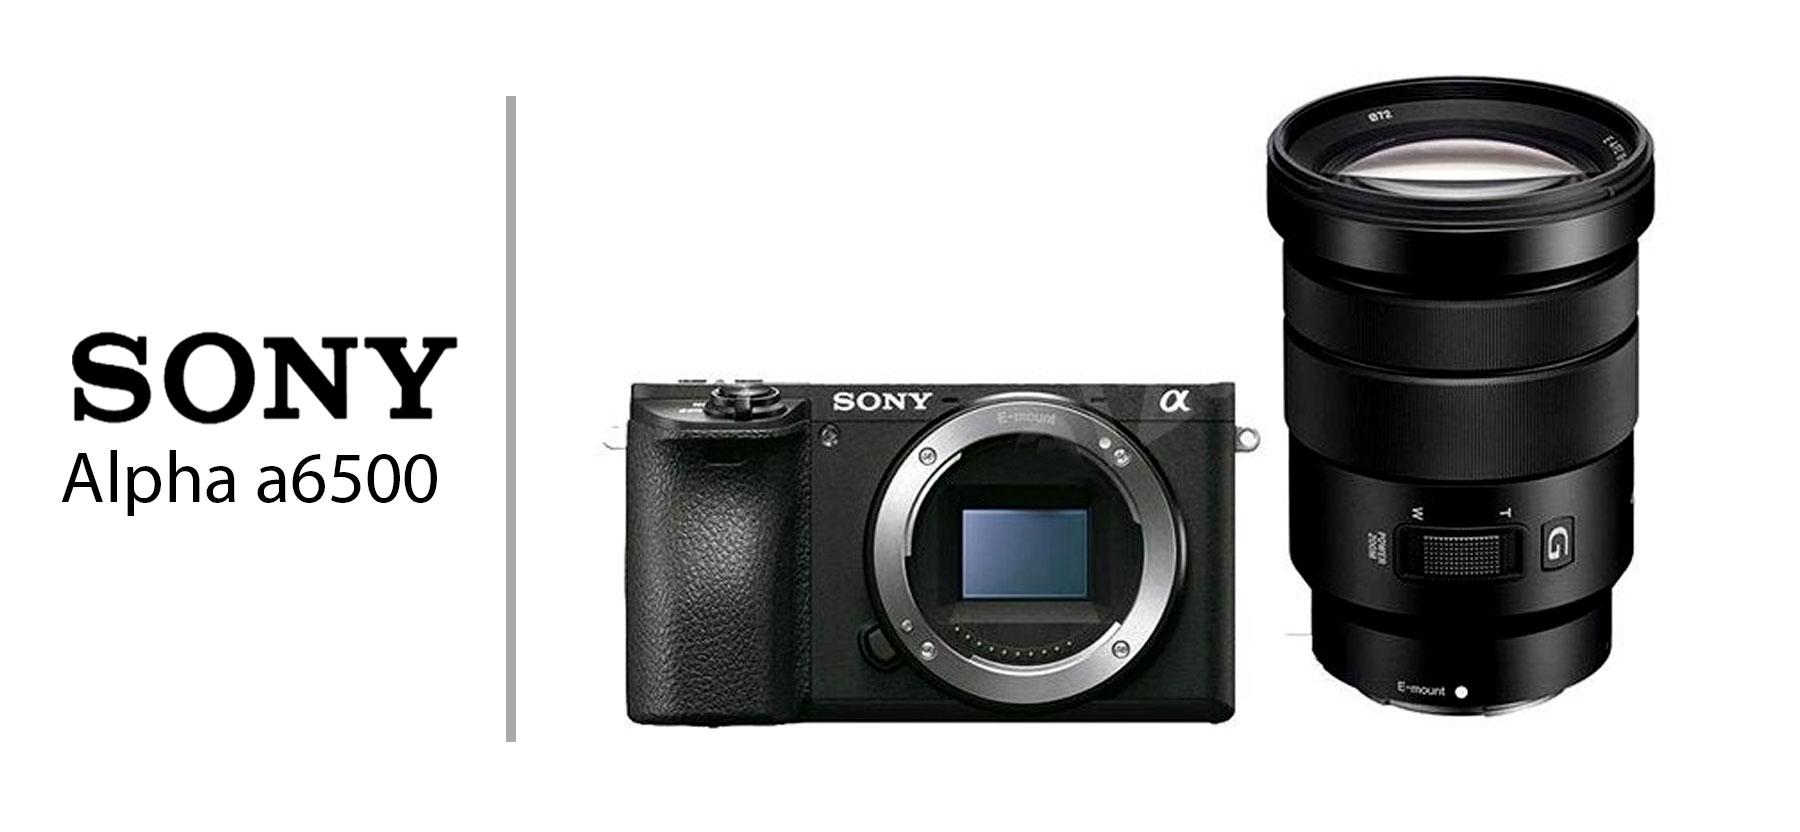 sony-alpha-a6500 best sony camera price in nepal